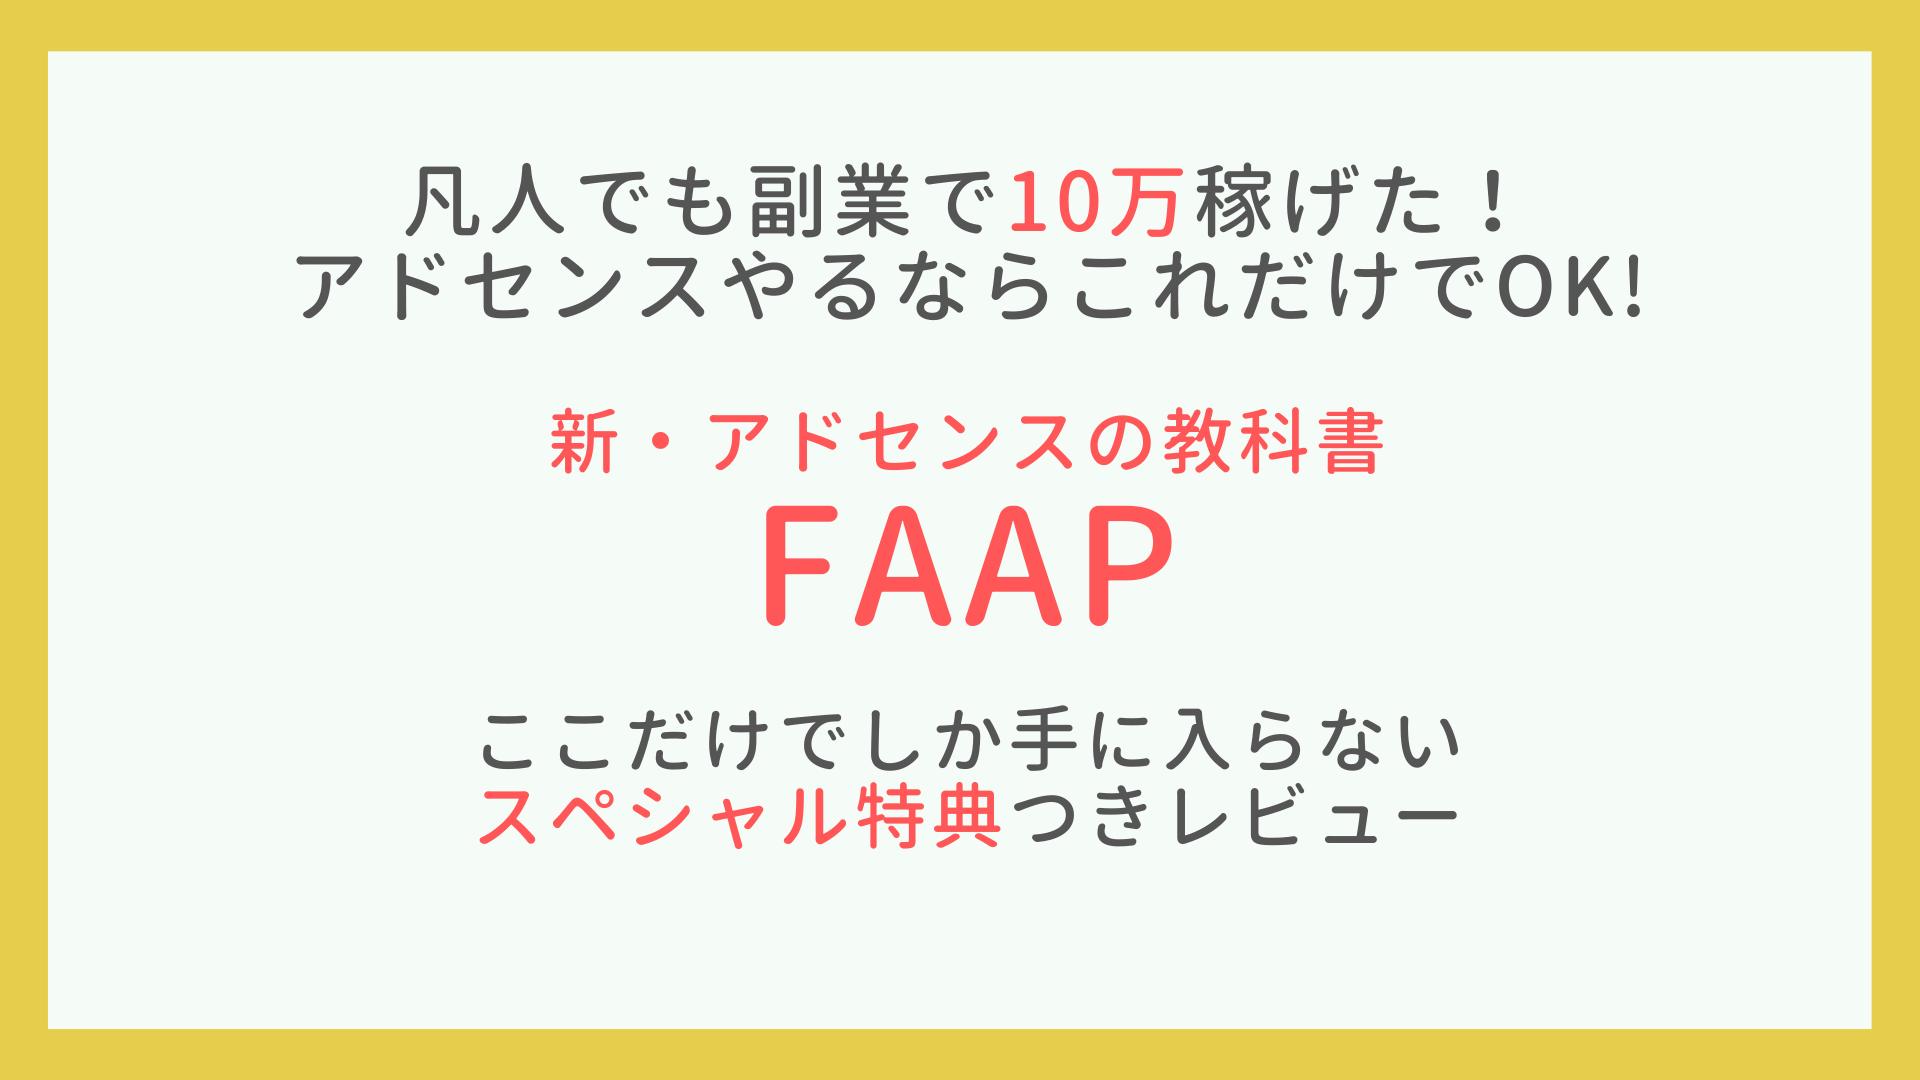 FAAP外注ブログ実践記レポート特典付きレビュー|40代からでもできるアドセンス